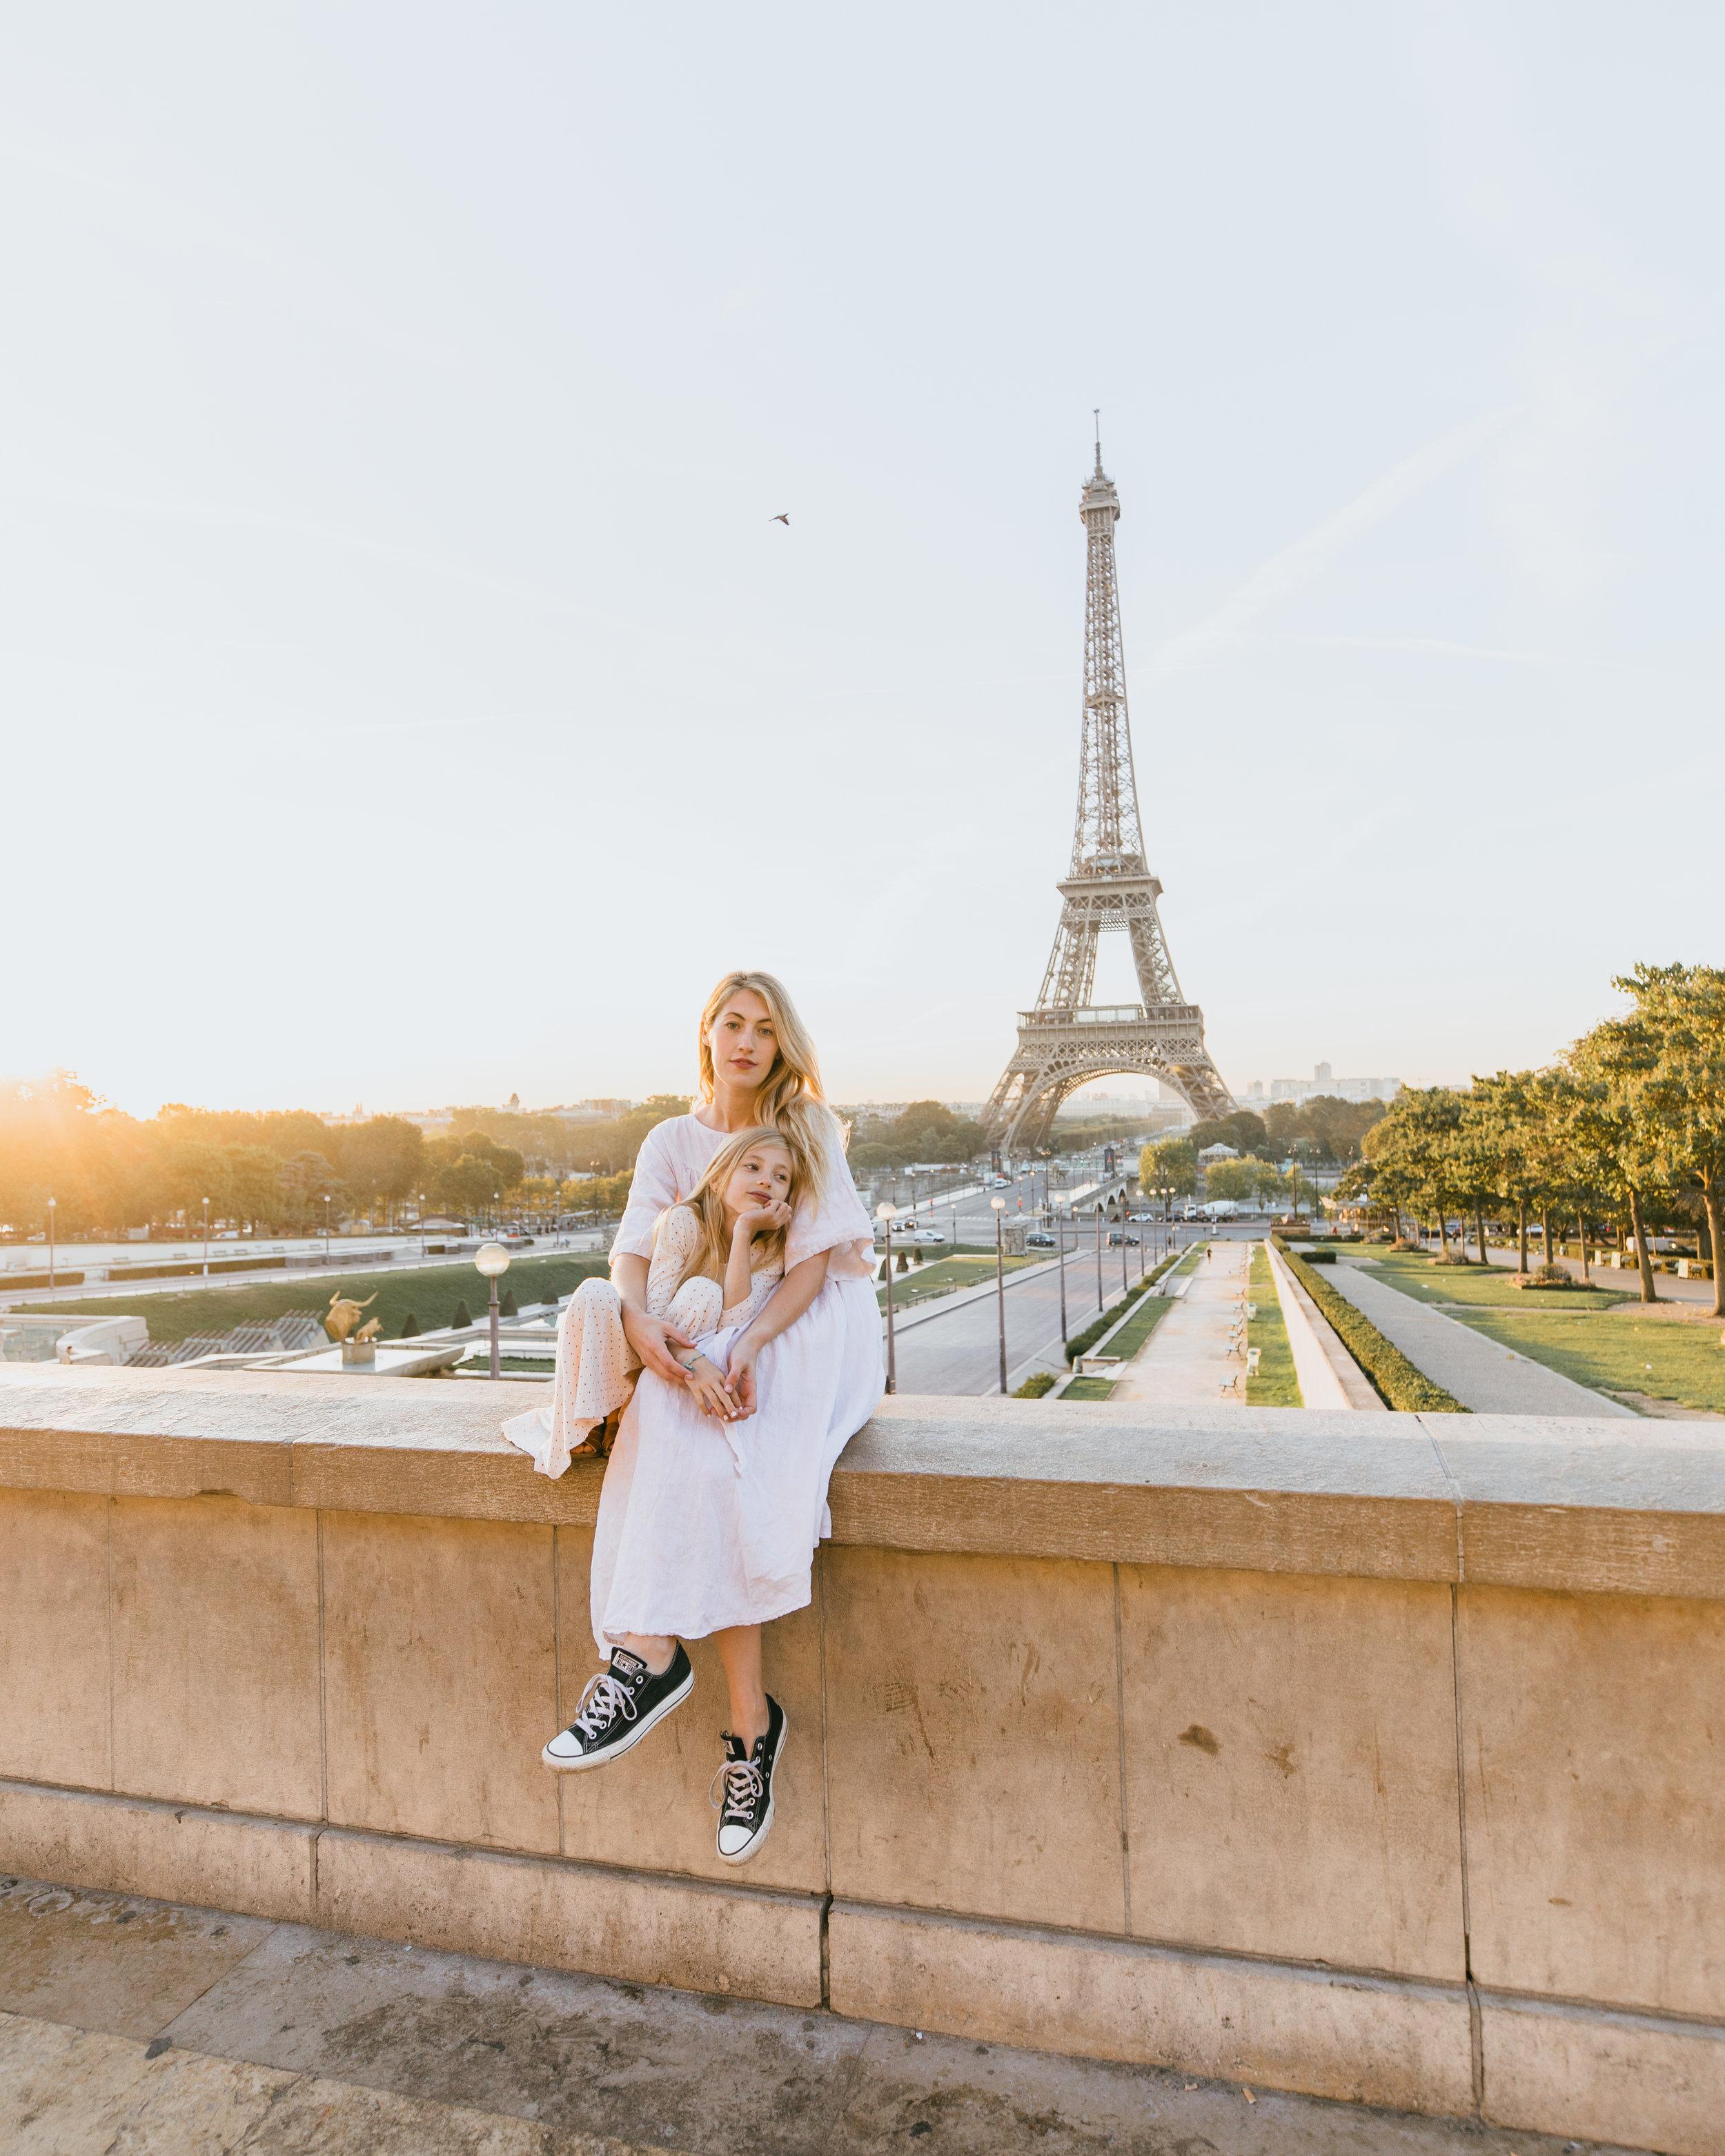 los angeles travel lifestyle photographer